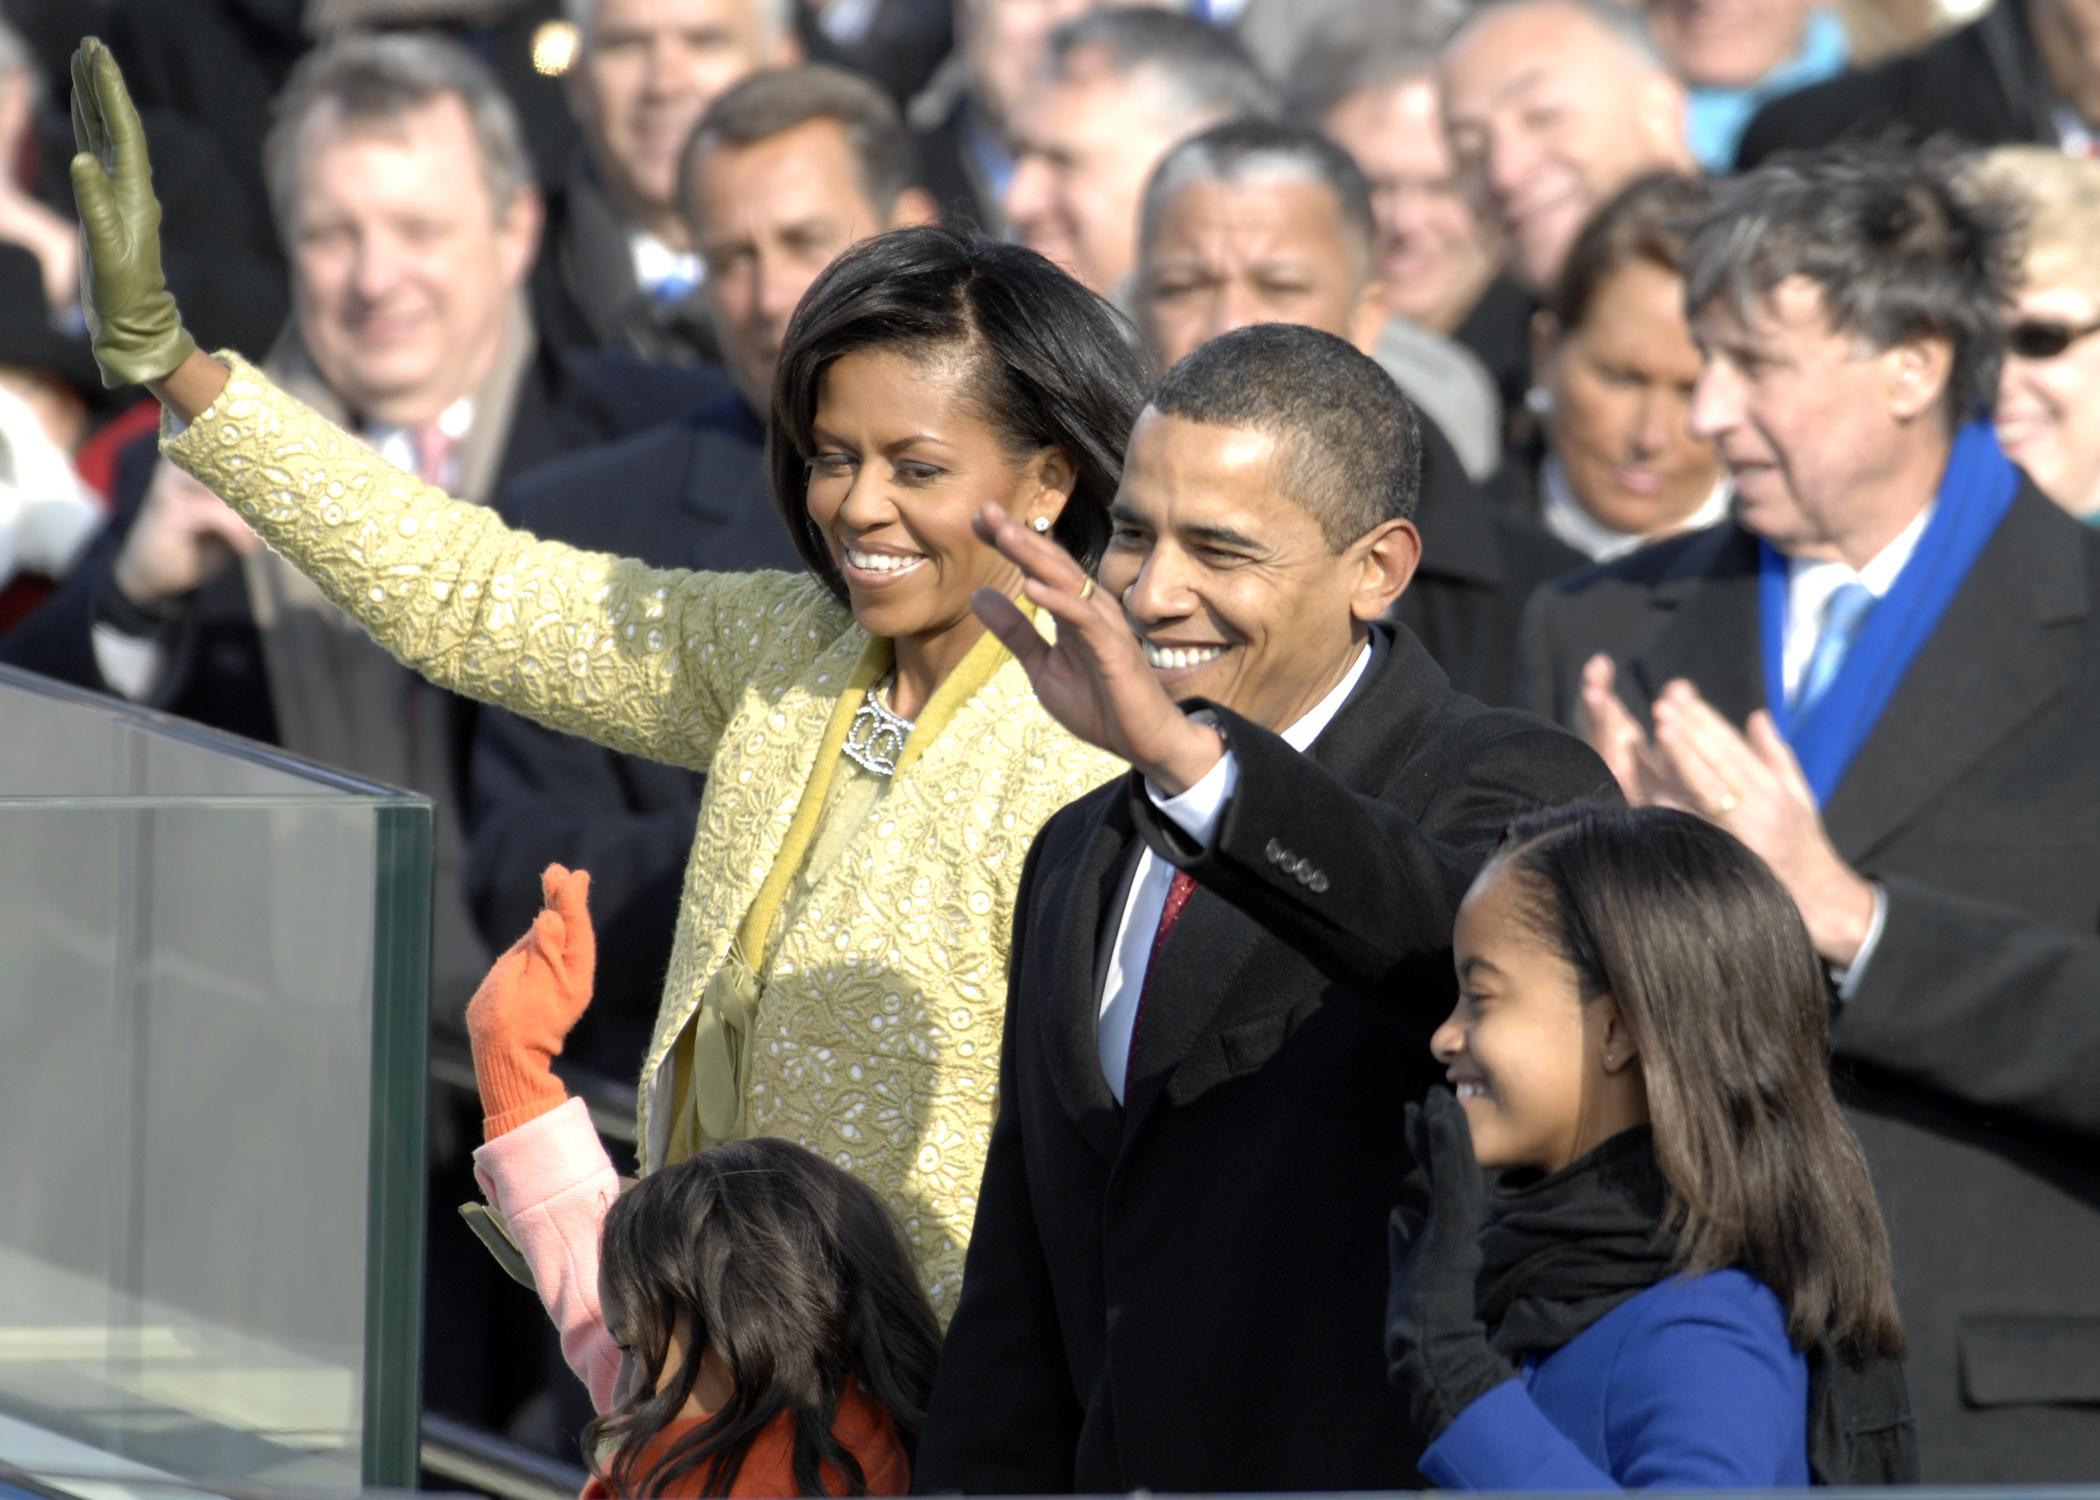 Obama Family at Inauguration